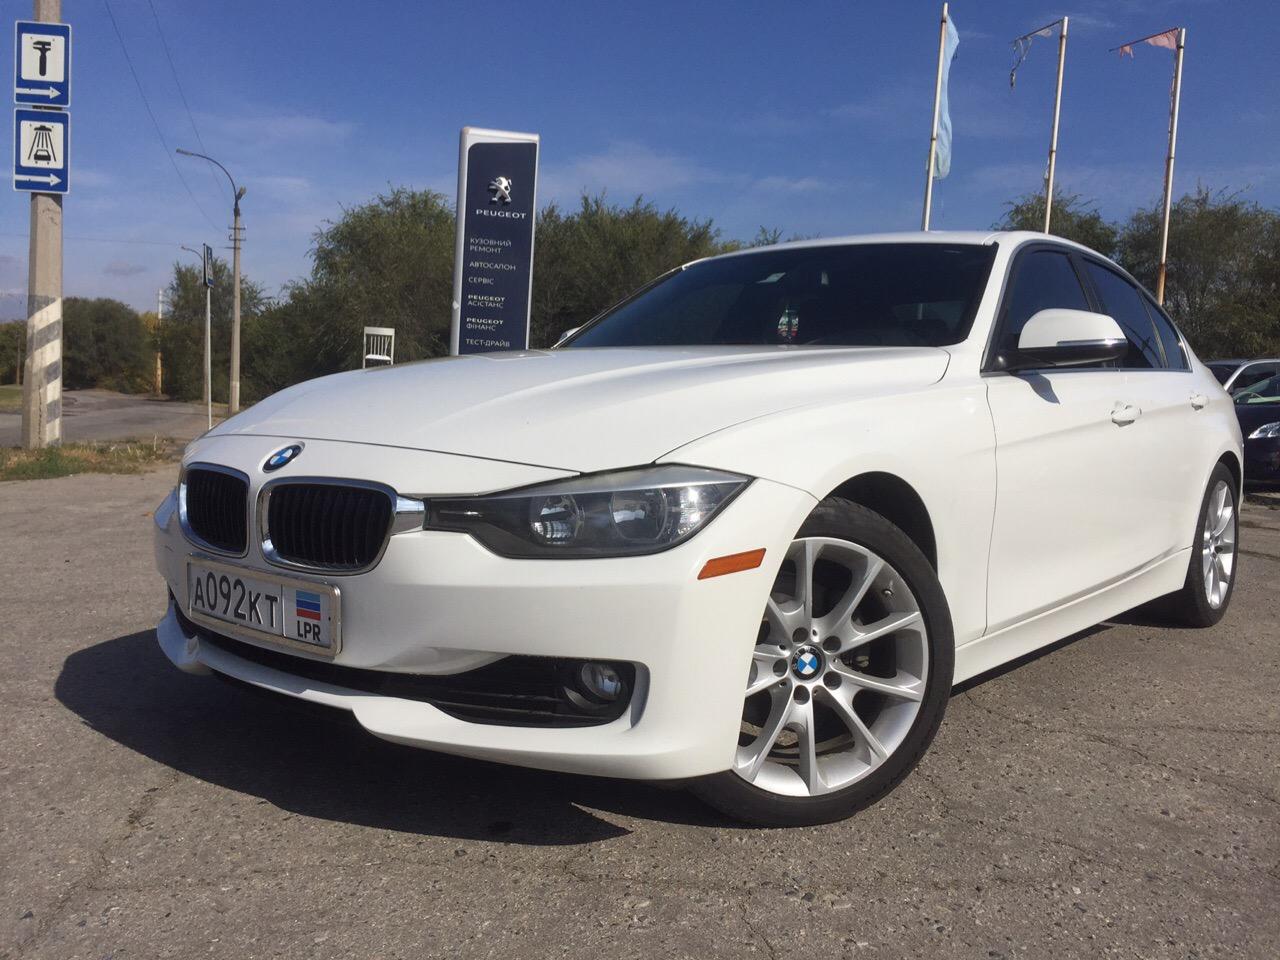 Фотографии BMW 320i 2015 в автосалоне Автомир